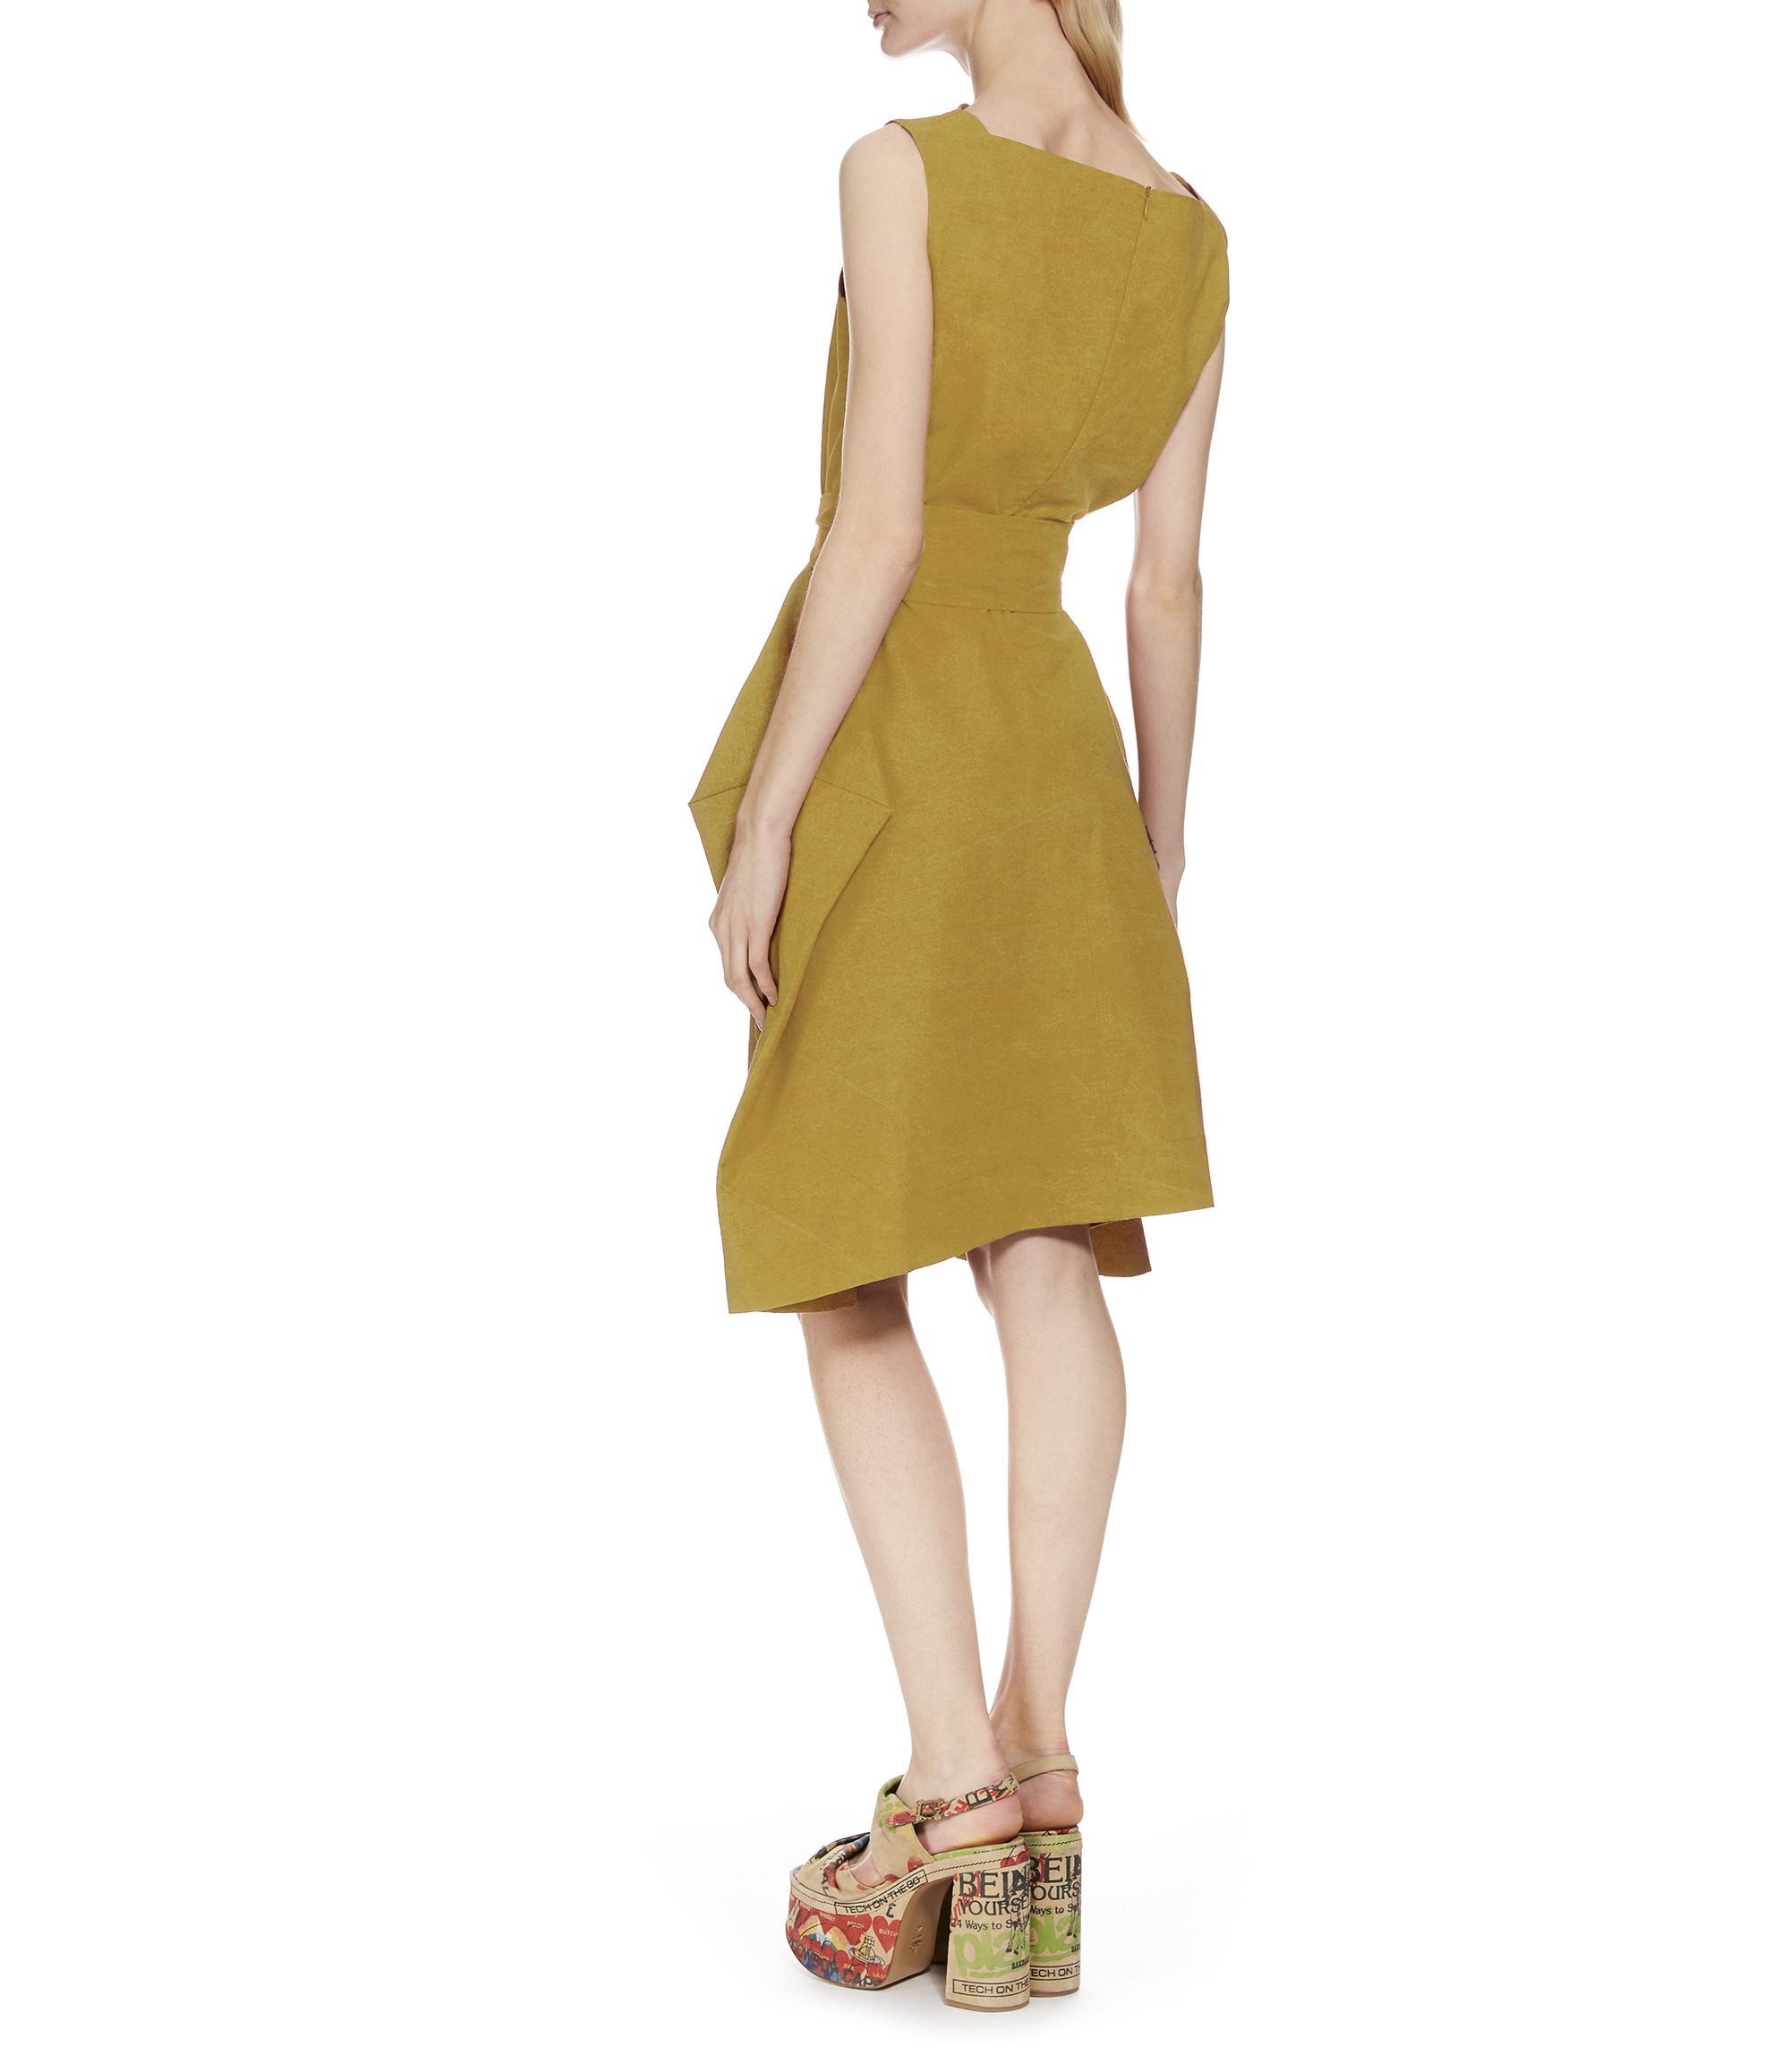 Yellow Lotus dress Vivienne Westwood 100% Guaranteed Sale Online Cheap Sale Popular Outlet Explore MzFA8r68LC